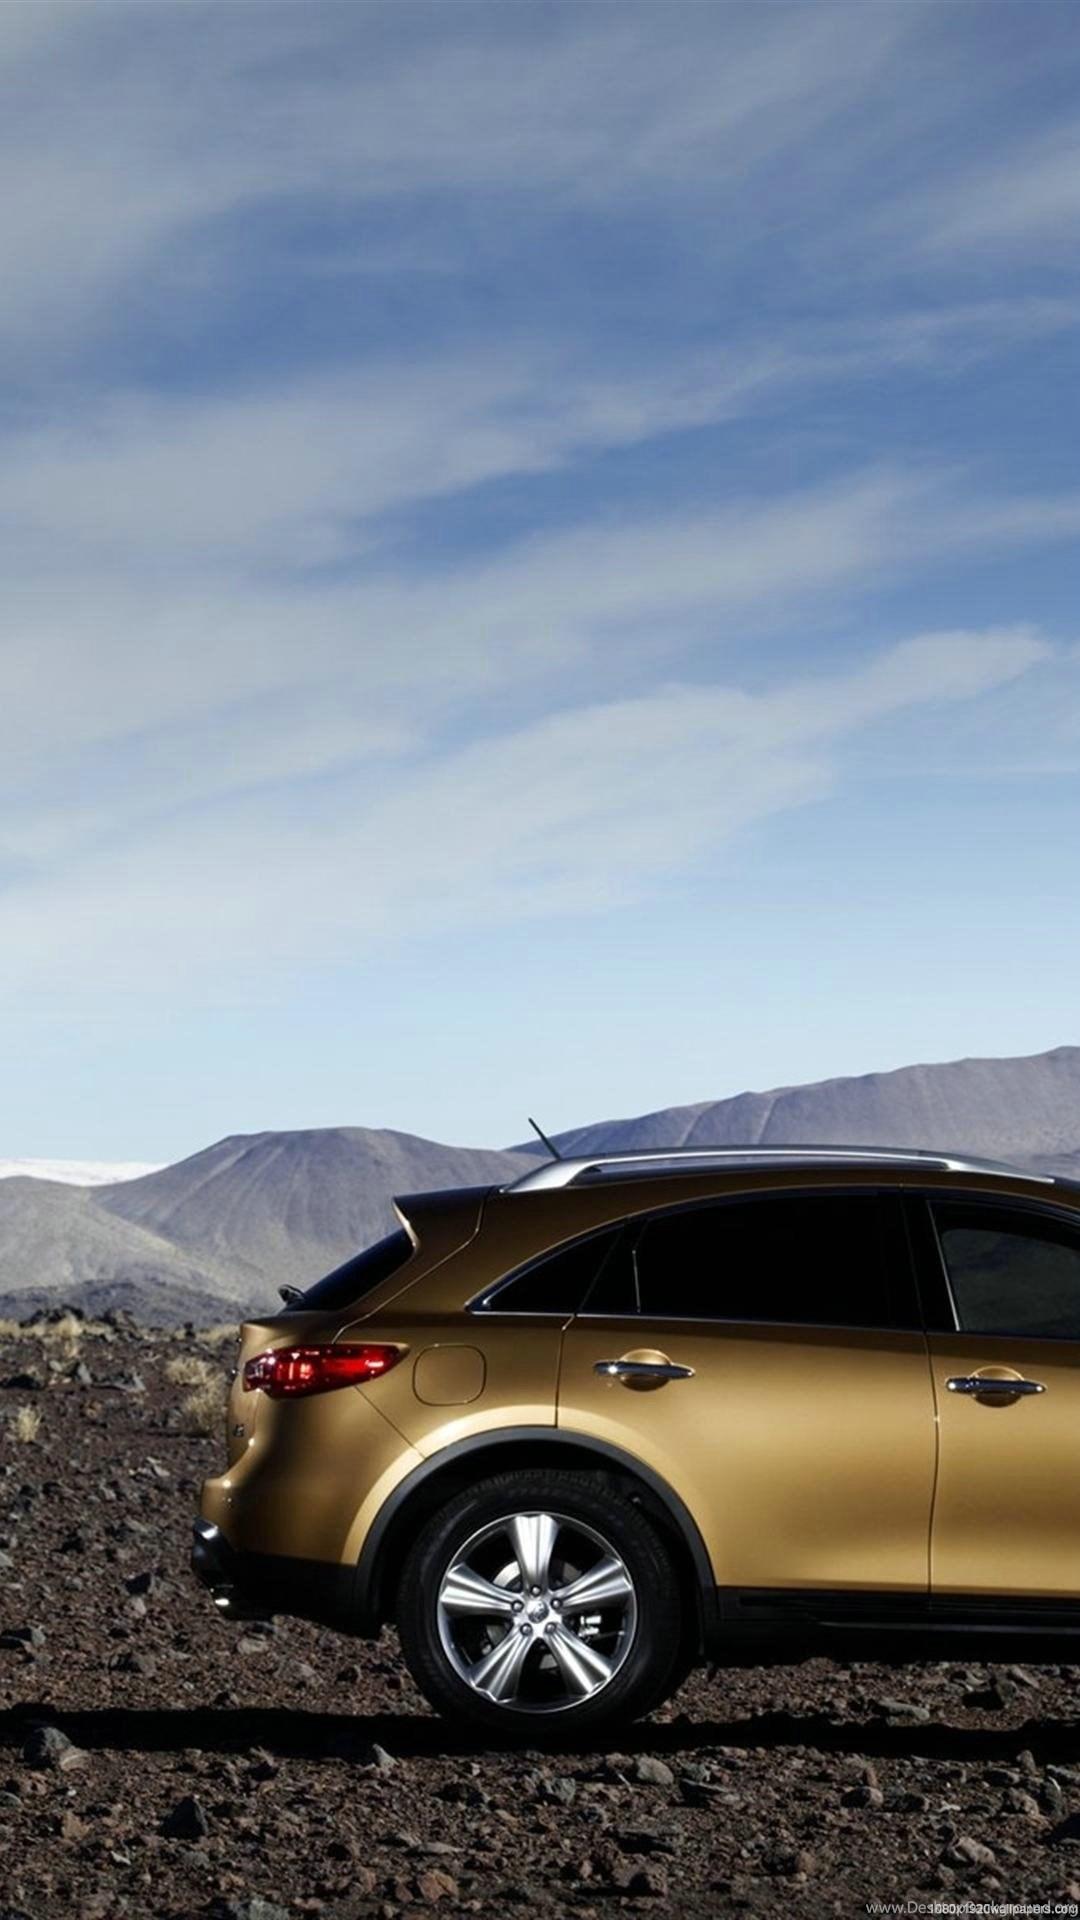 1080x1920 Chevrolet Car Wallpapers HD Desktop Background